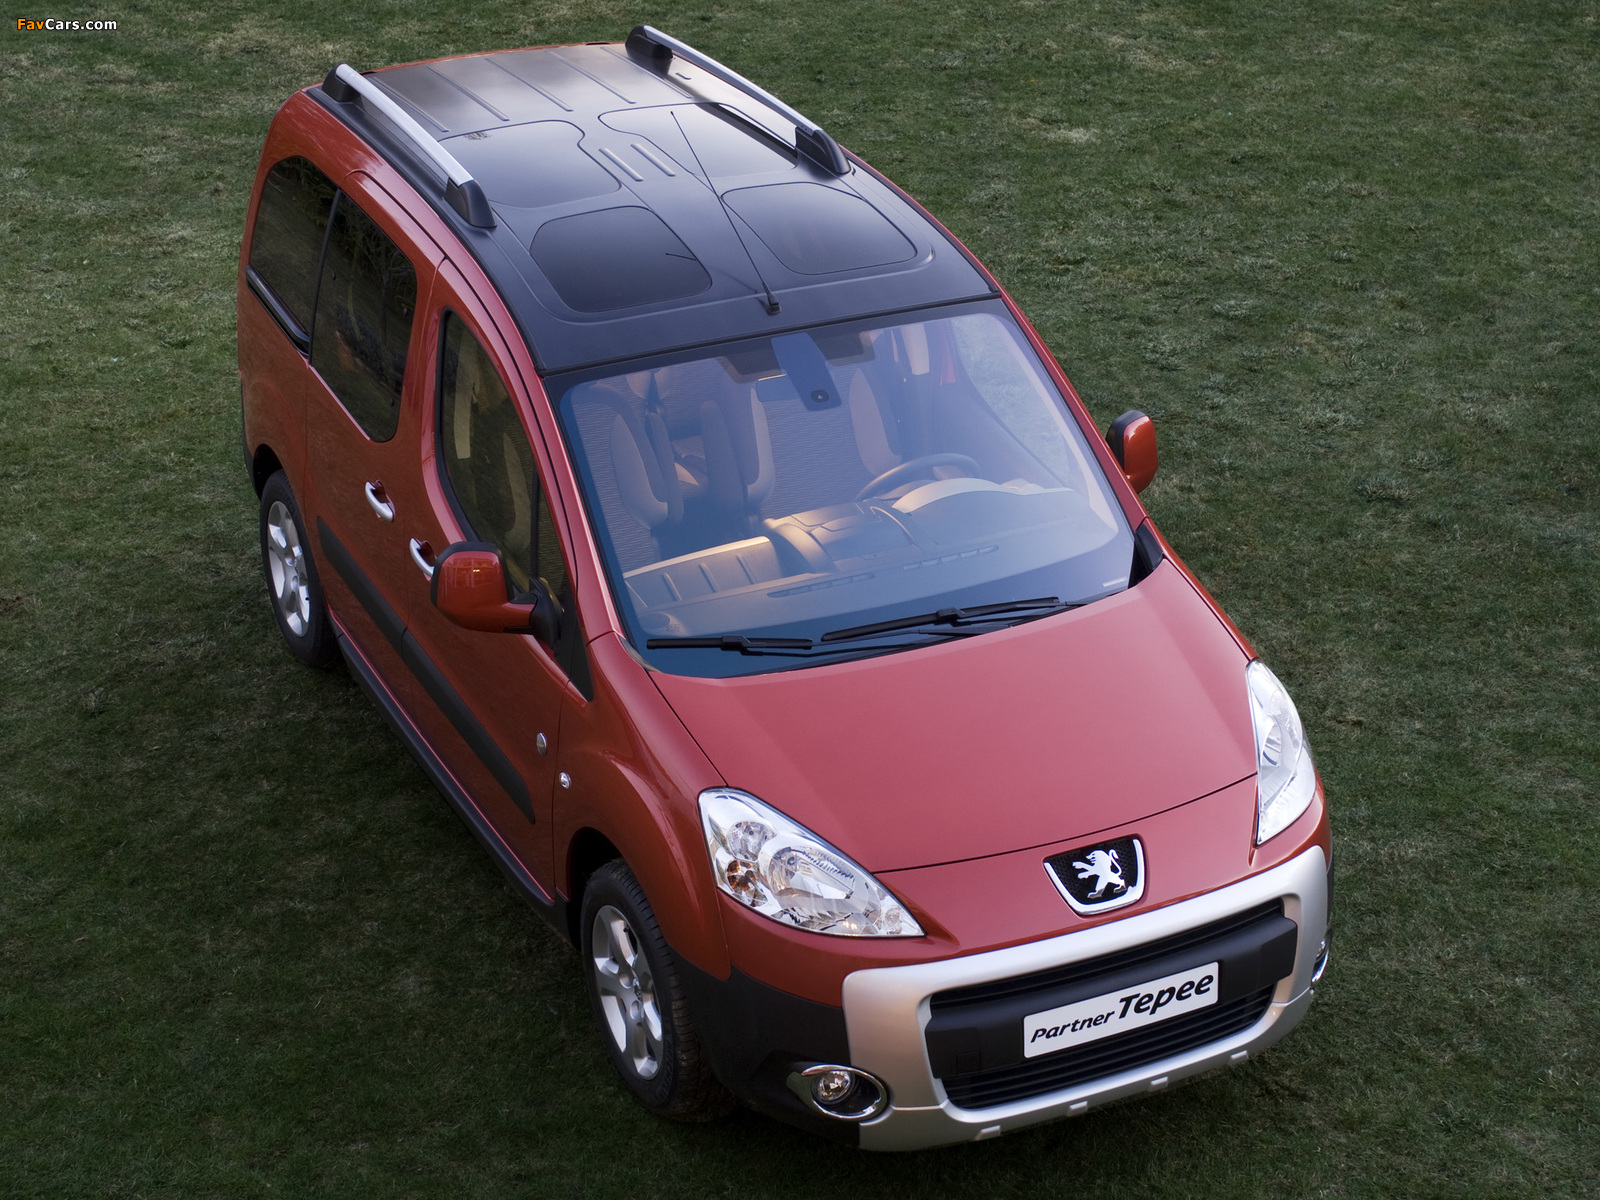 Peugeot Partner Tepee Outdoor Pack 2010 photos (1600 x 1200)